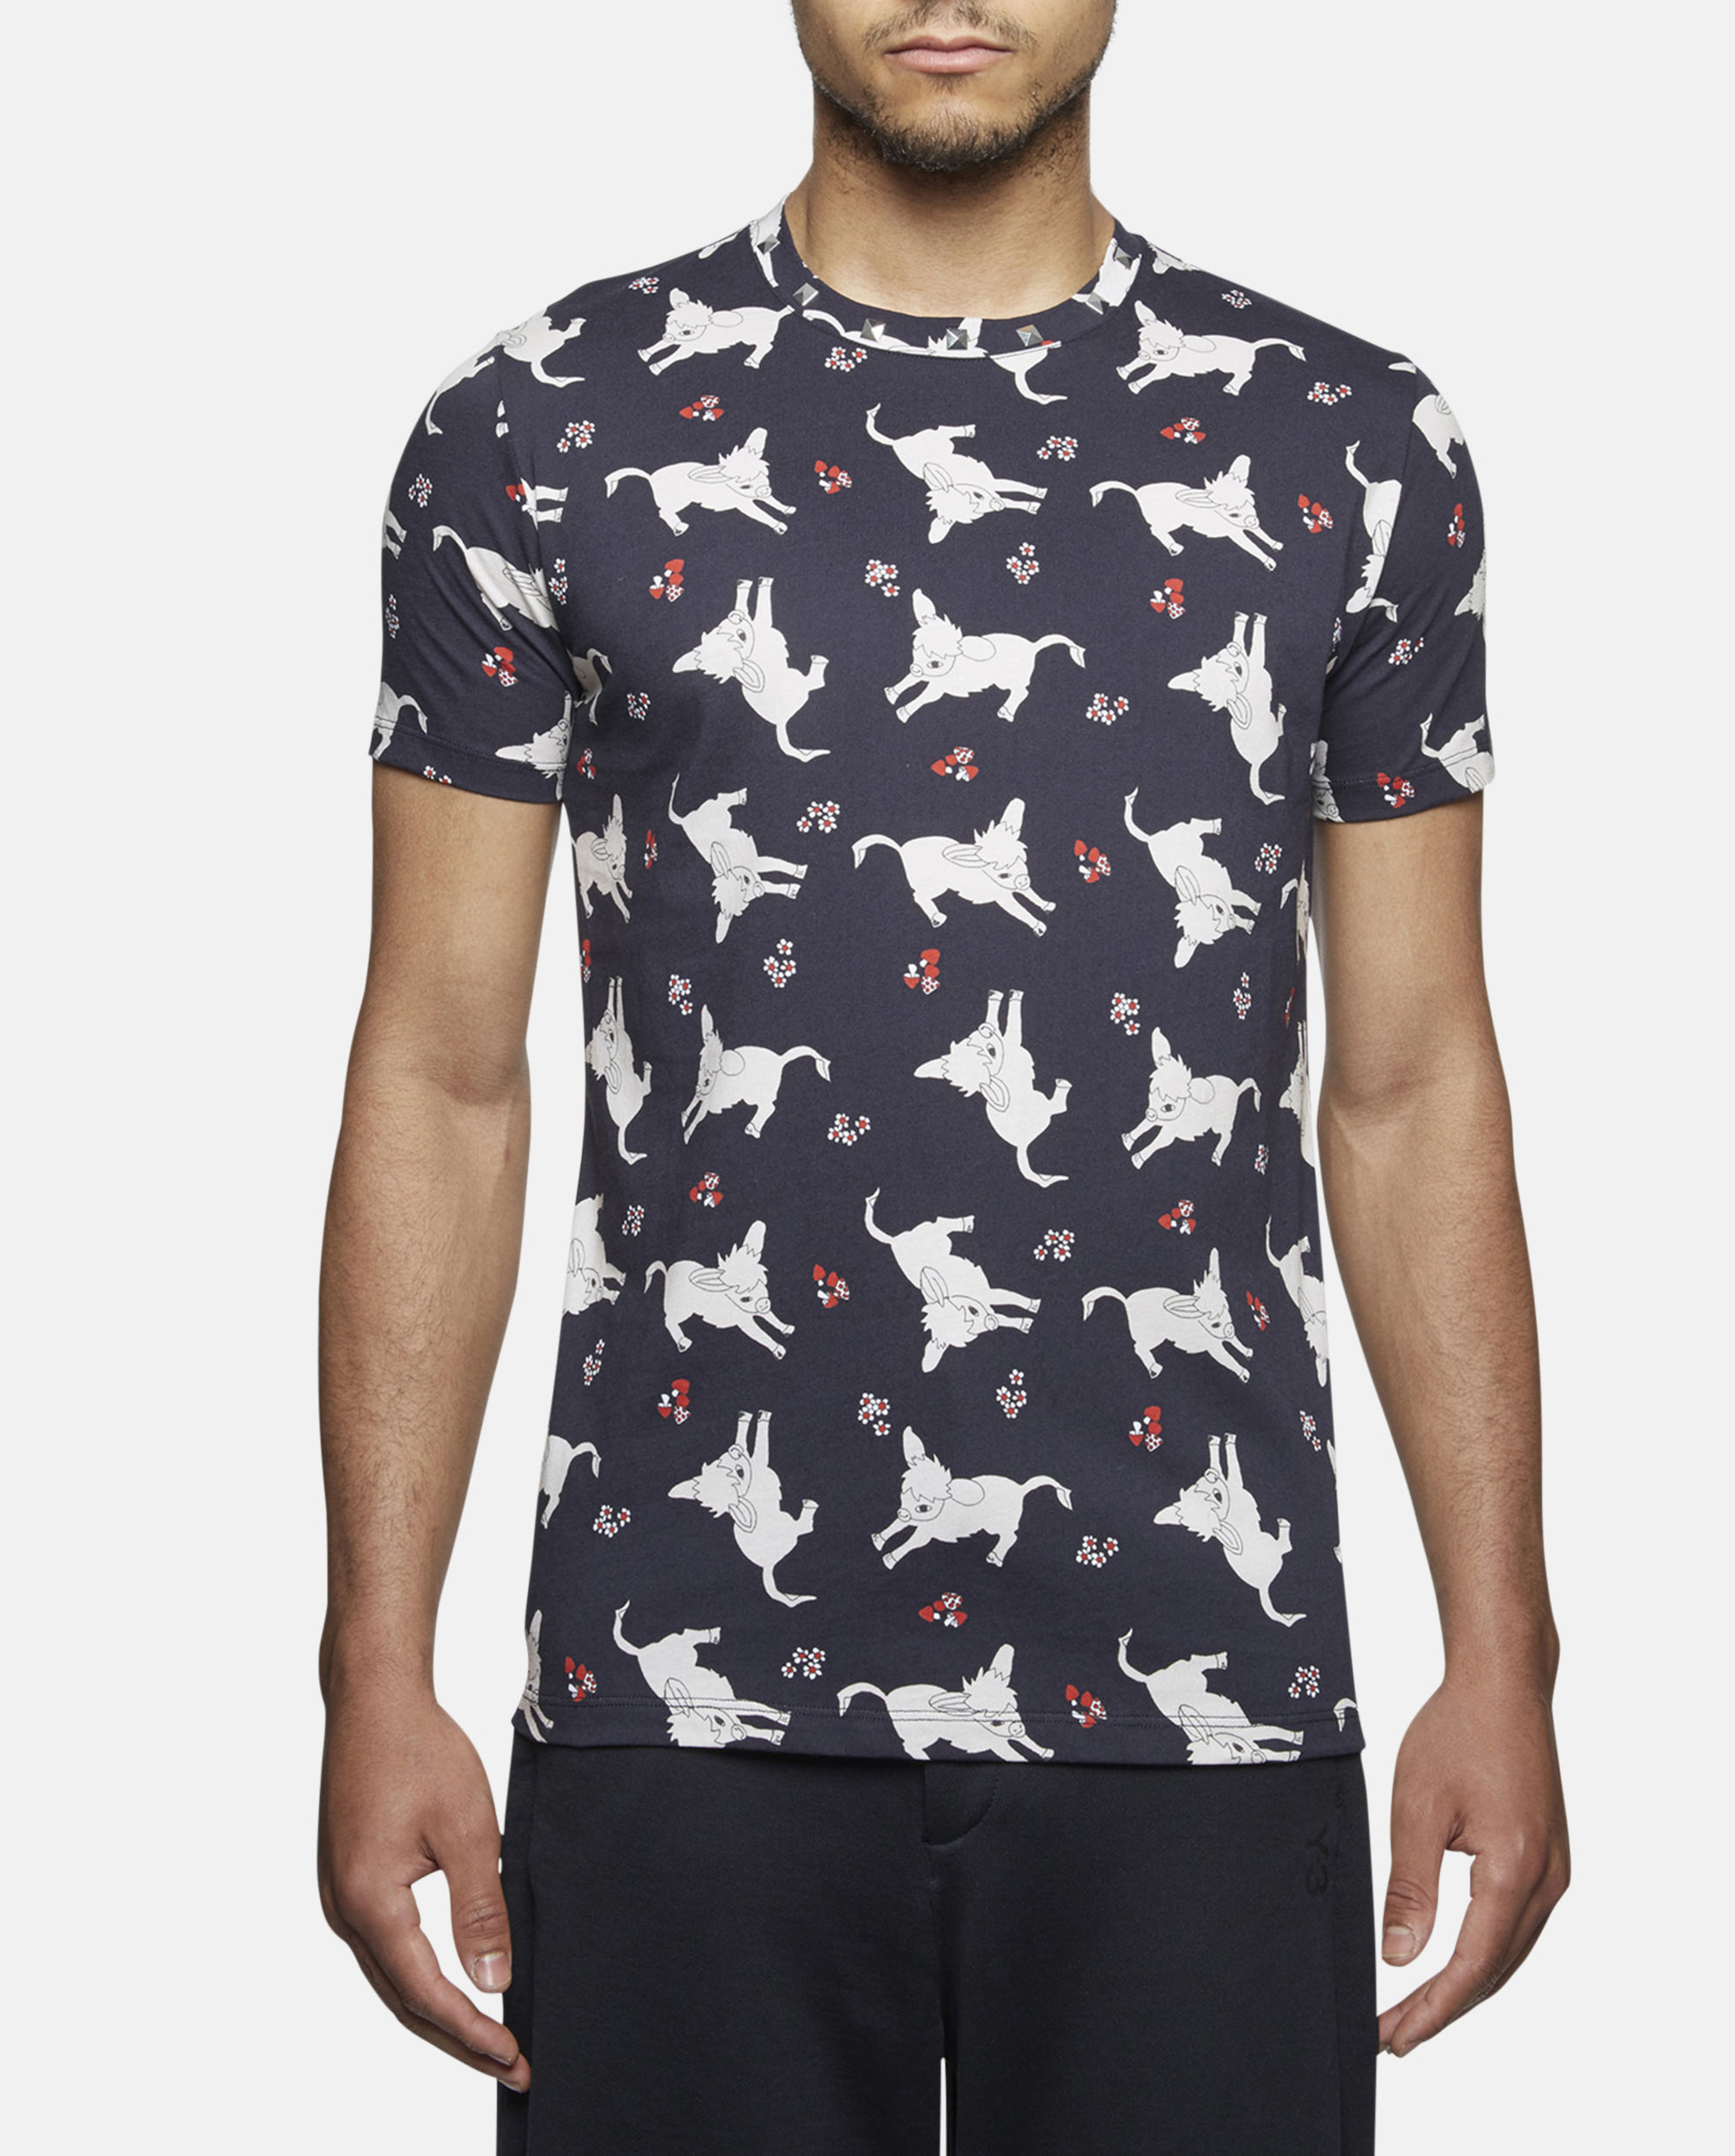 j w anderson donkey print t shirt for men lyst